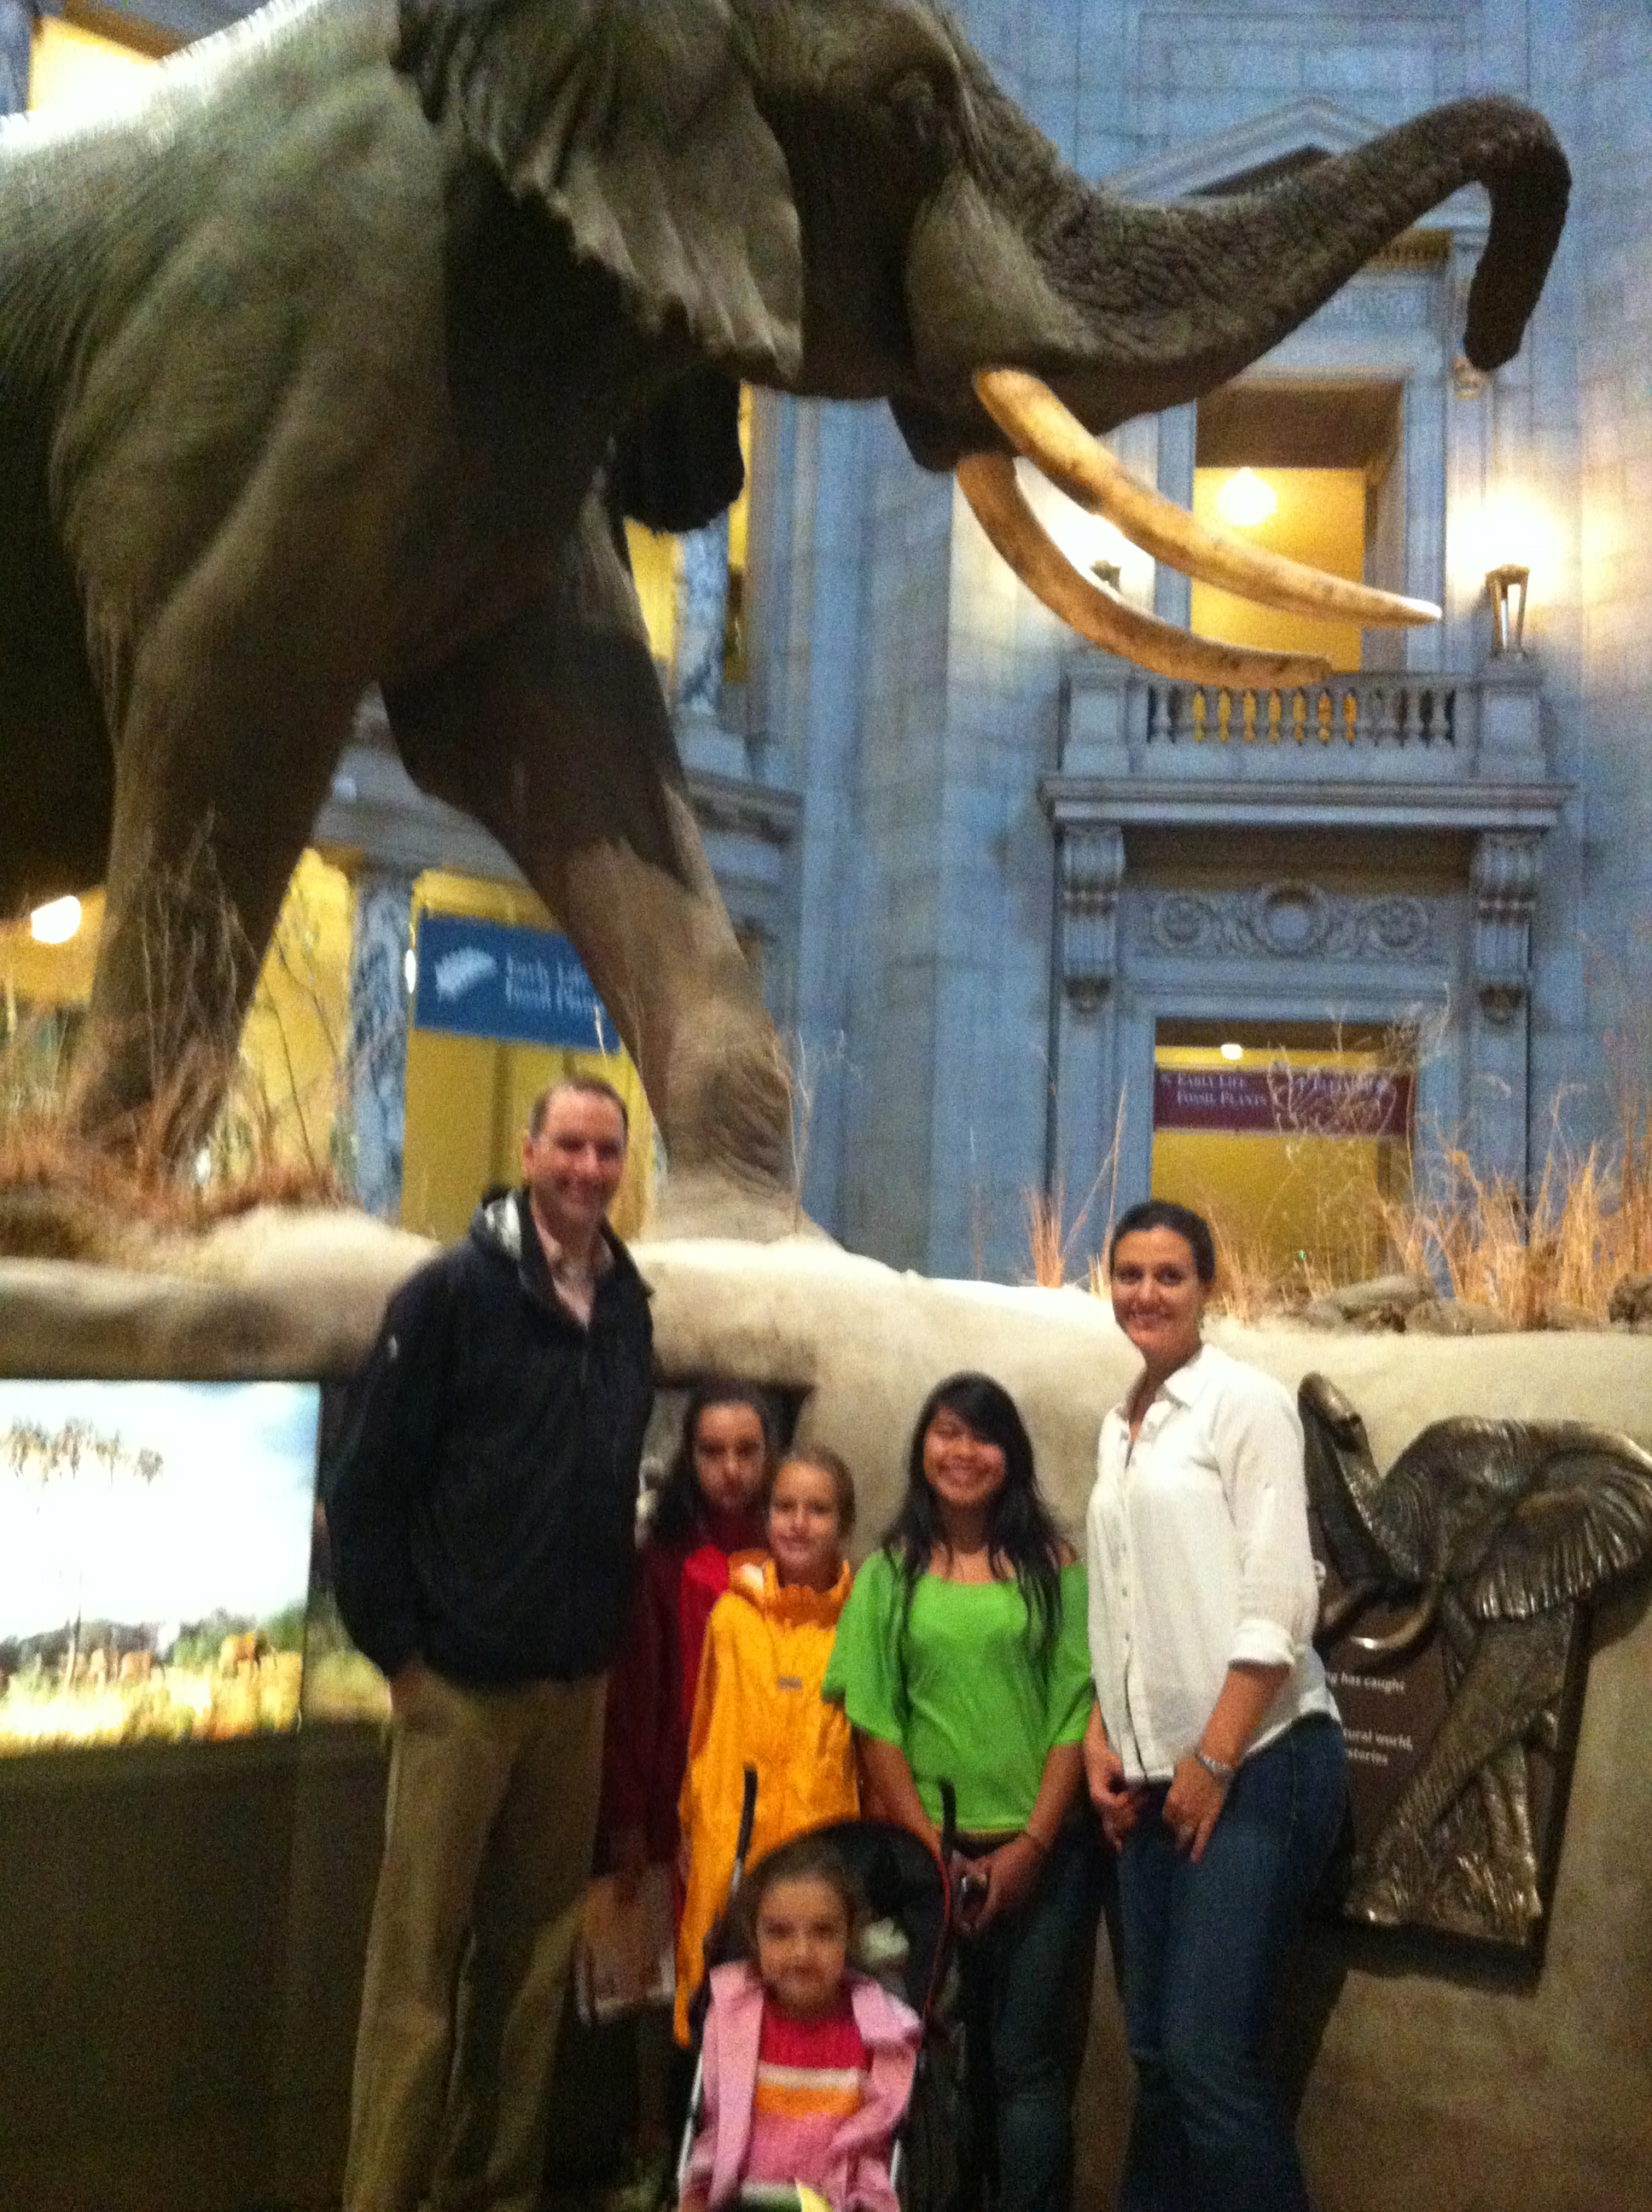 Smithsonian.